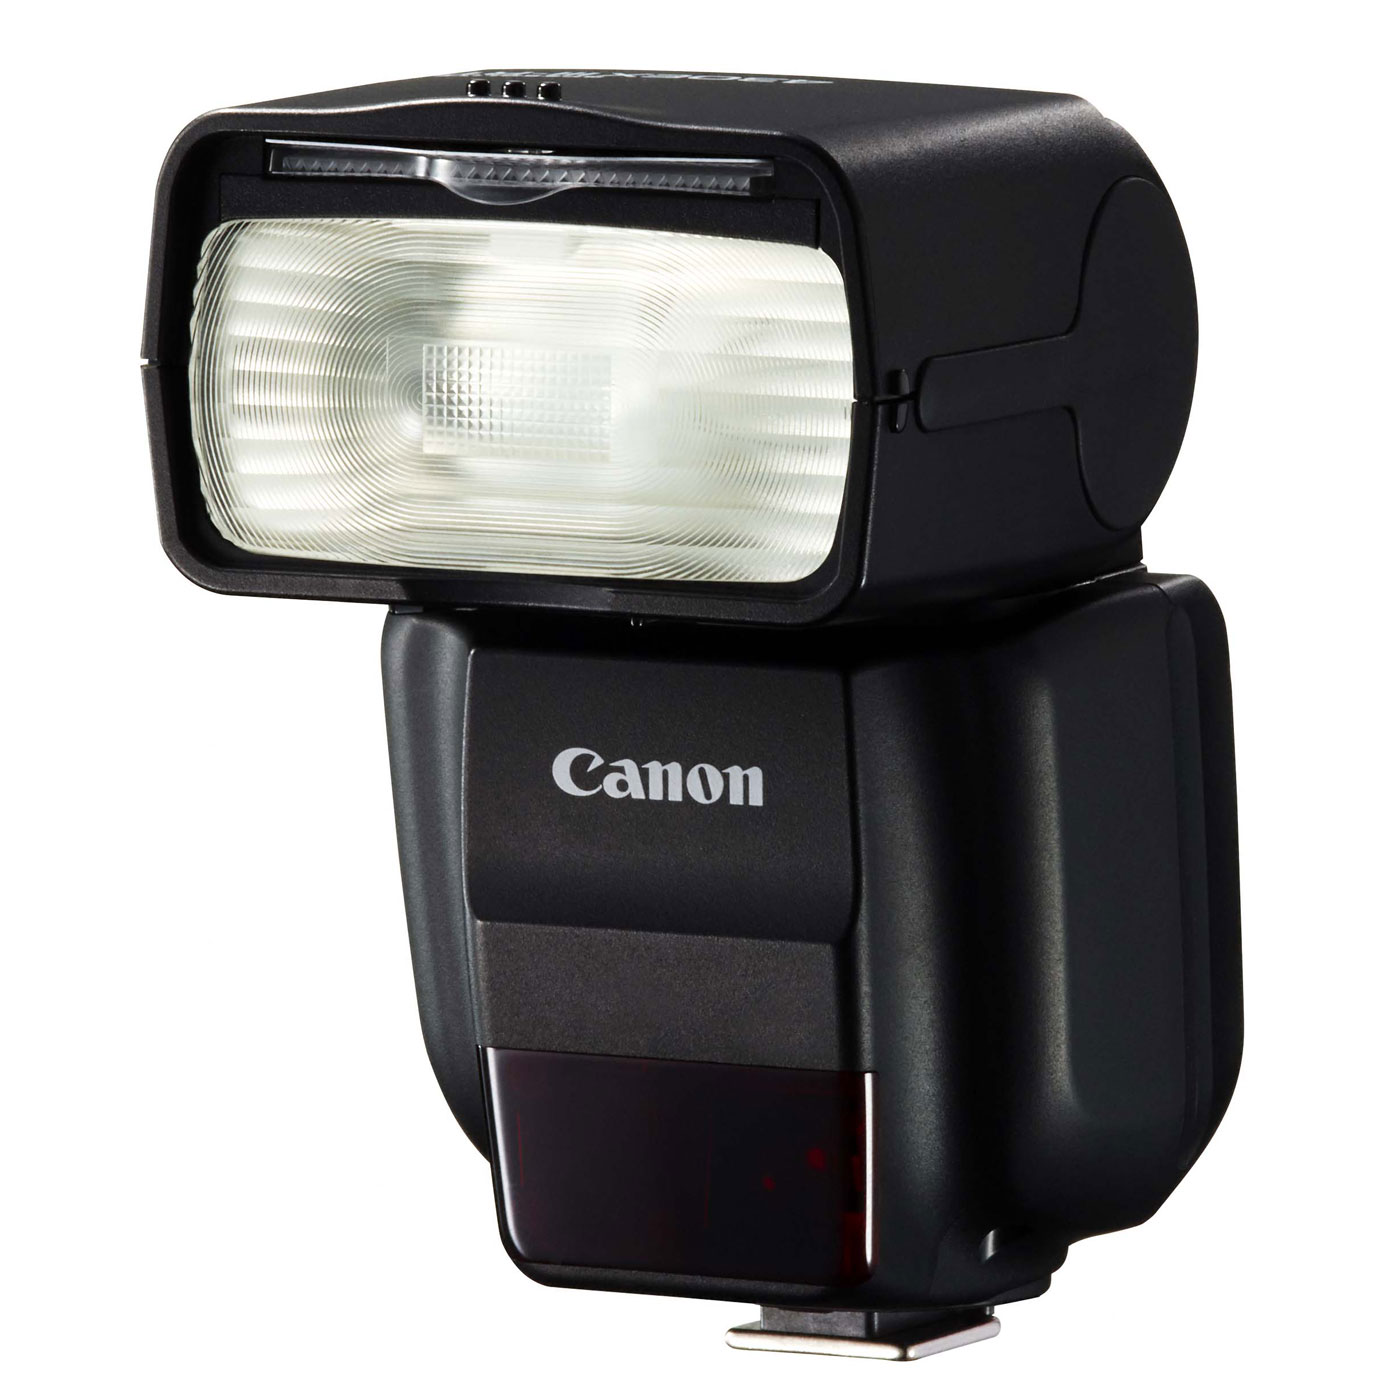 canon speedlite 430ex iii rt flash appareil photo canon. Black Bedroom Furniture Sets. Home Design Ideas